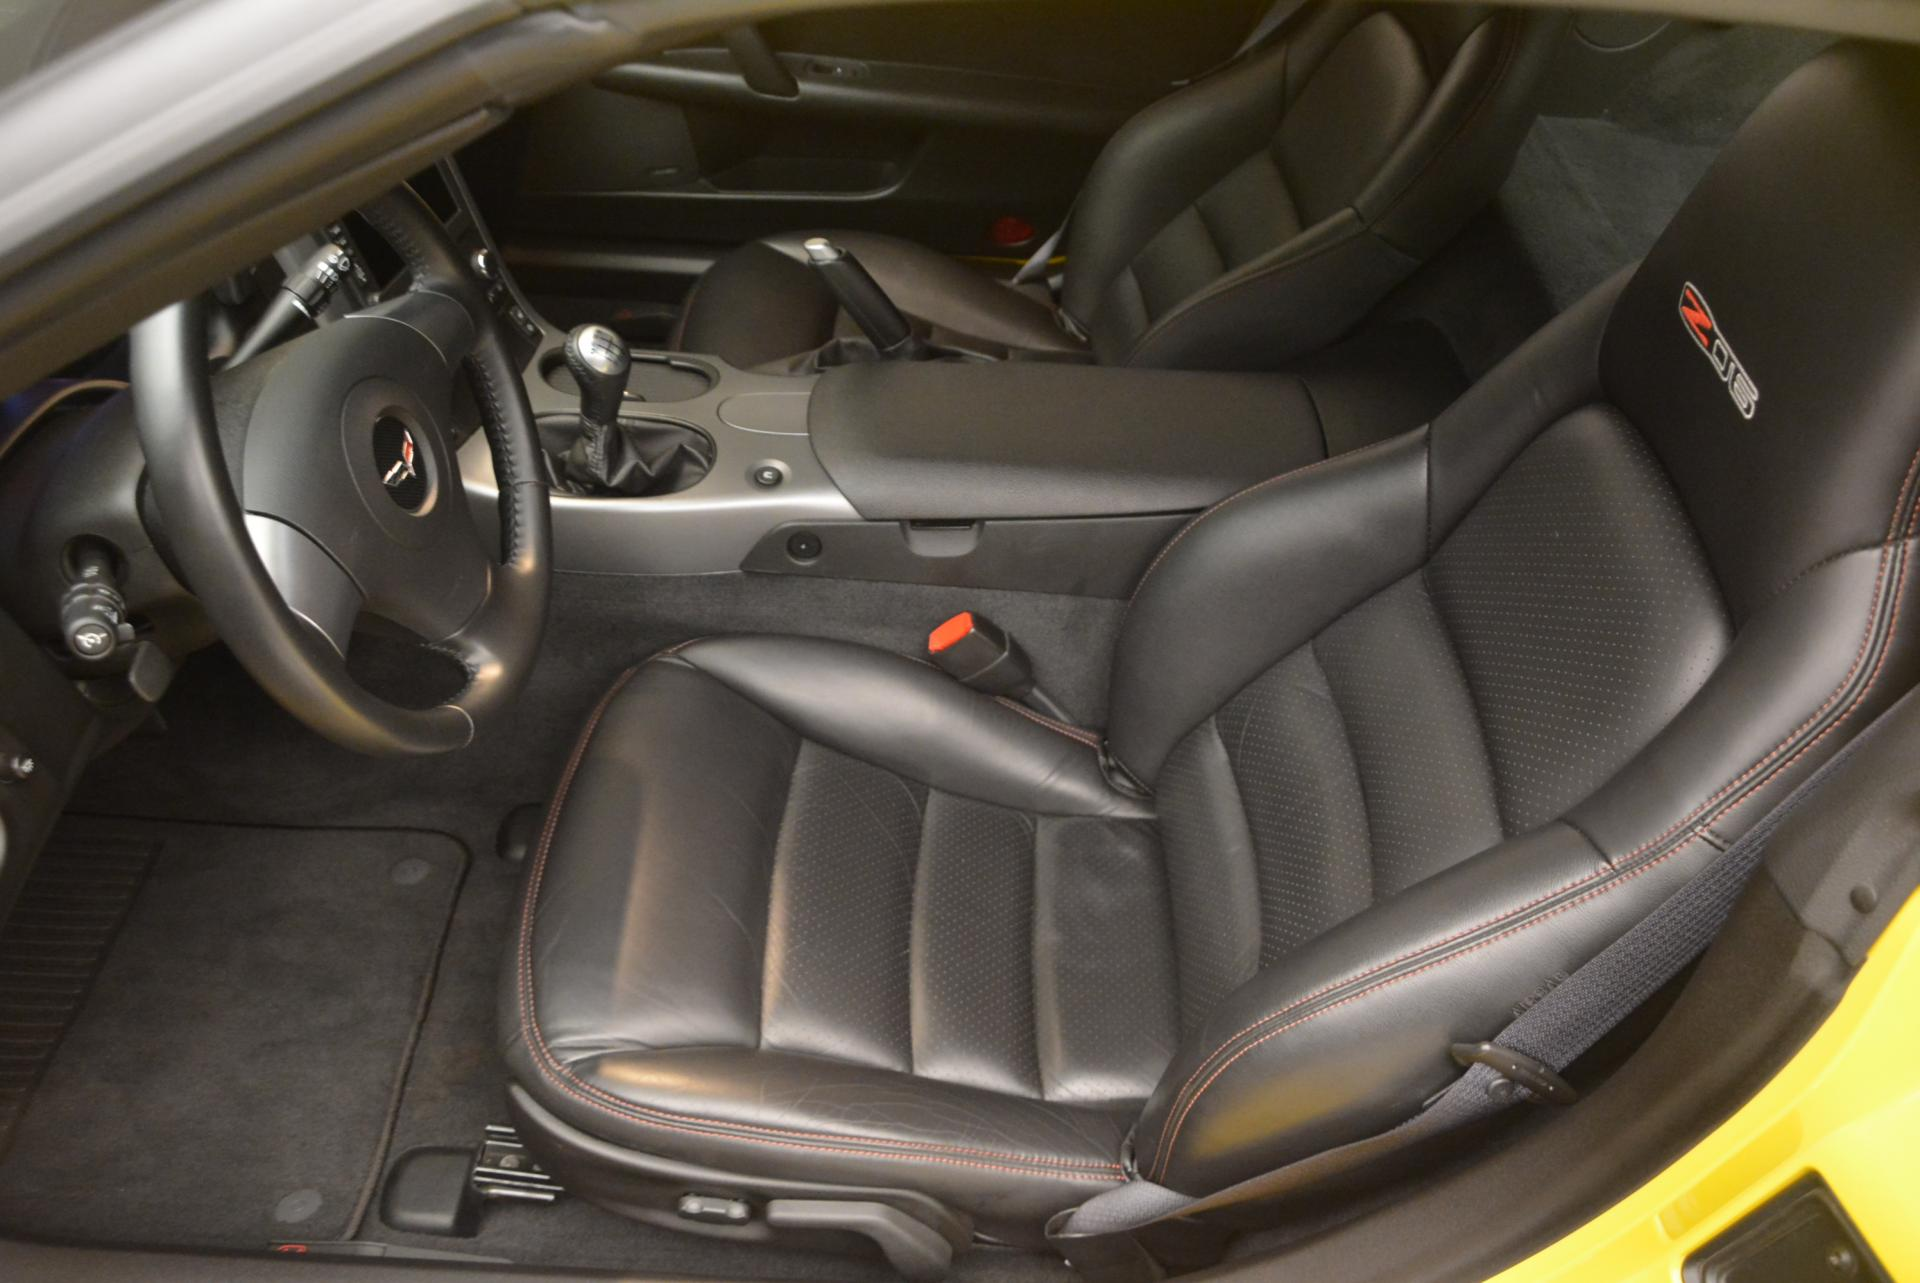 Used 2006 Chevrolet Corvette Z06 Hardtop For Sale In Greenwich, CT. Alfa Romeo of Greenwich, 7085 530_p13